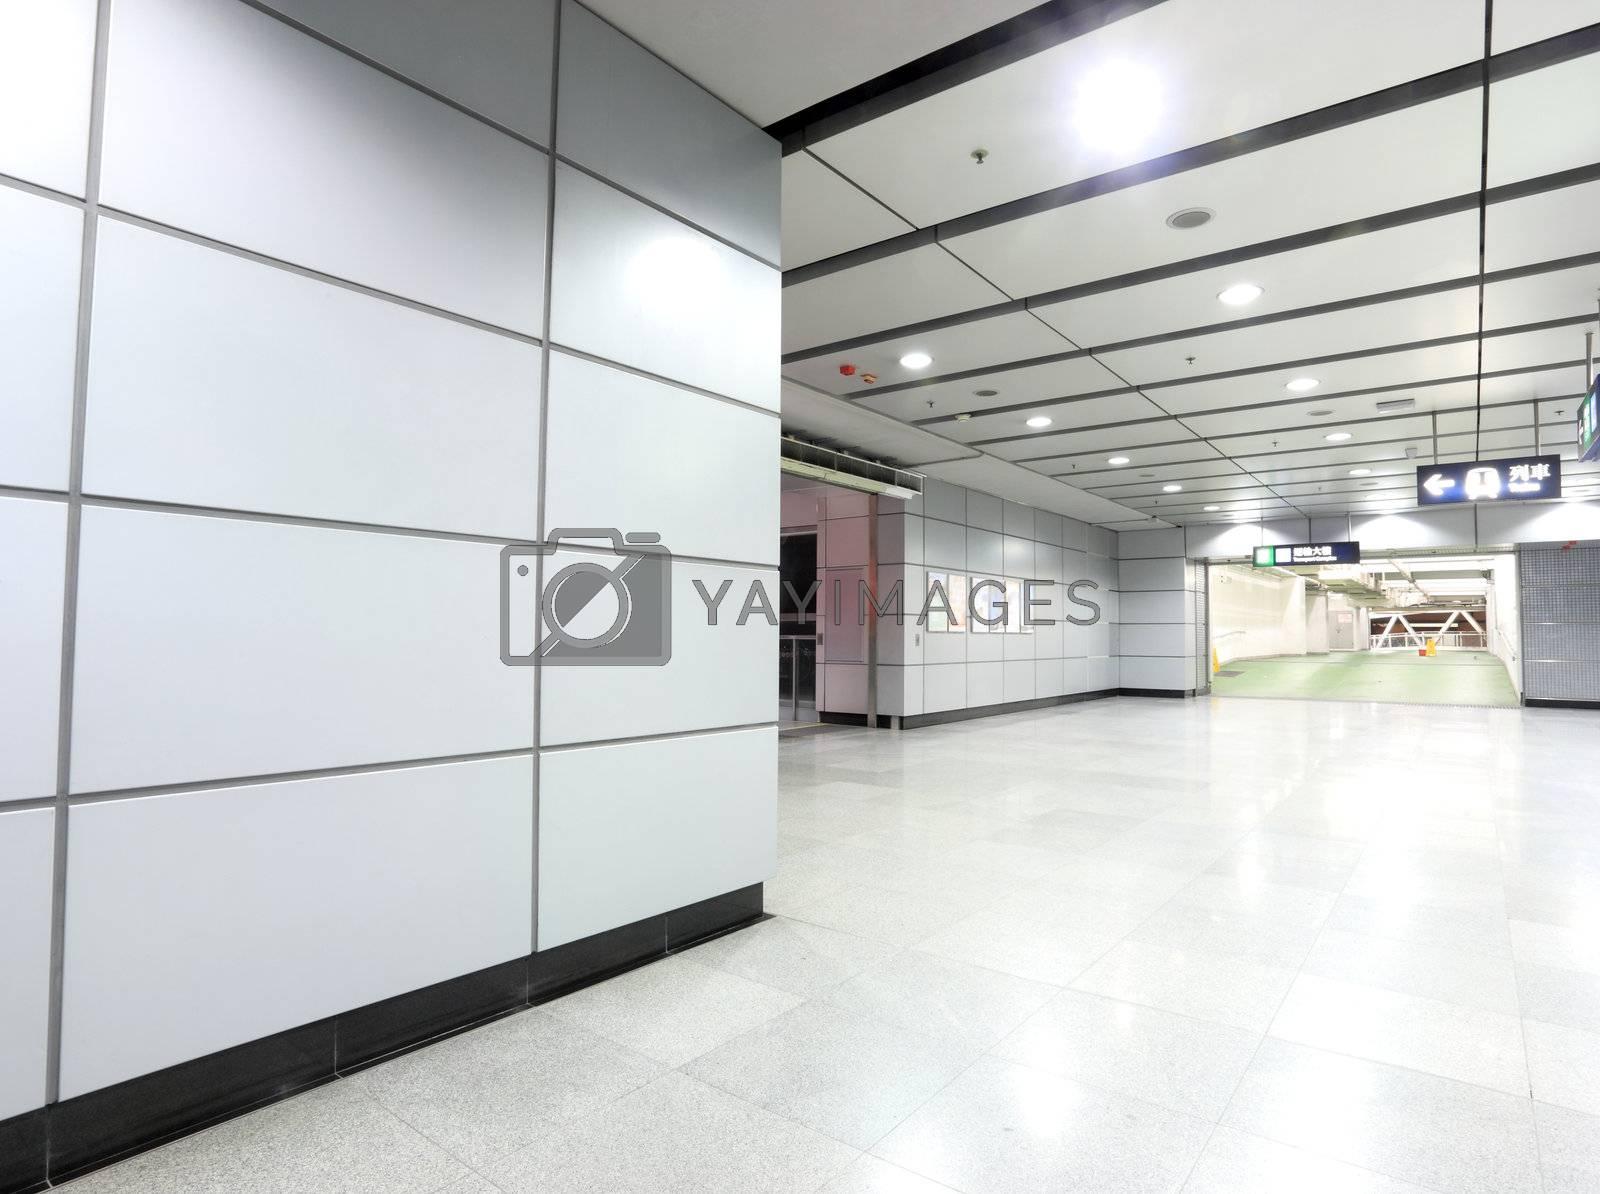 Royalty free image of modern metro station by leungchopan